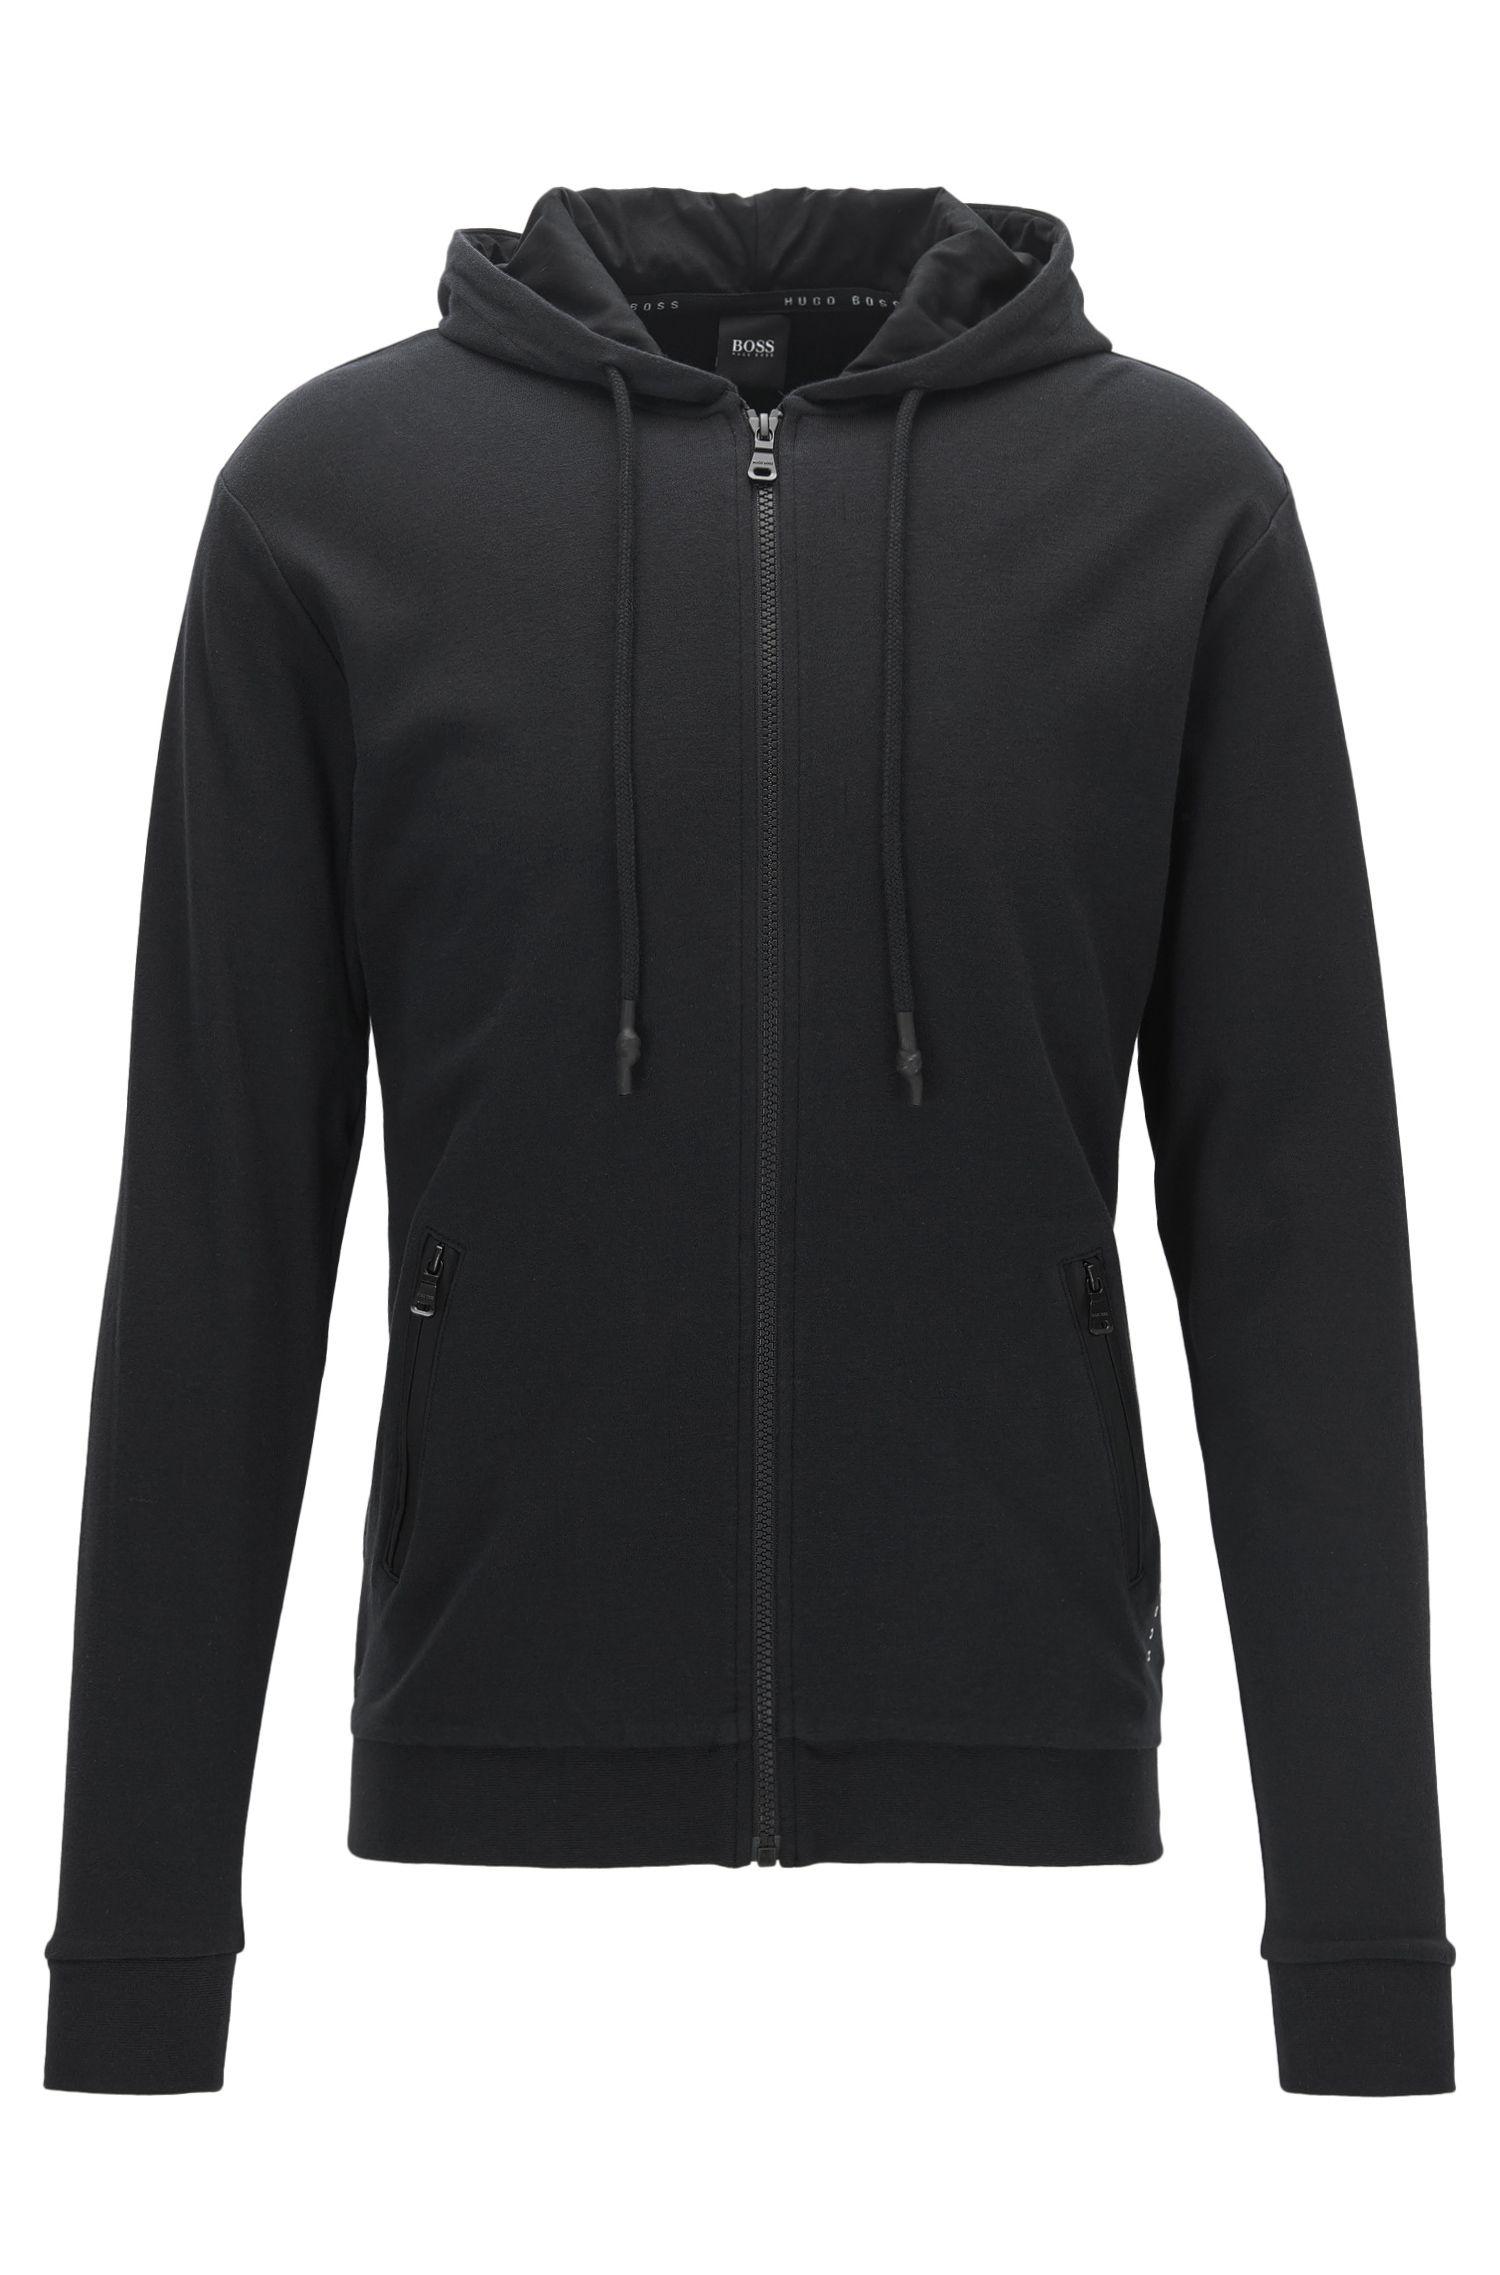 Zip-through hooded jacket in interlock cotton